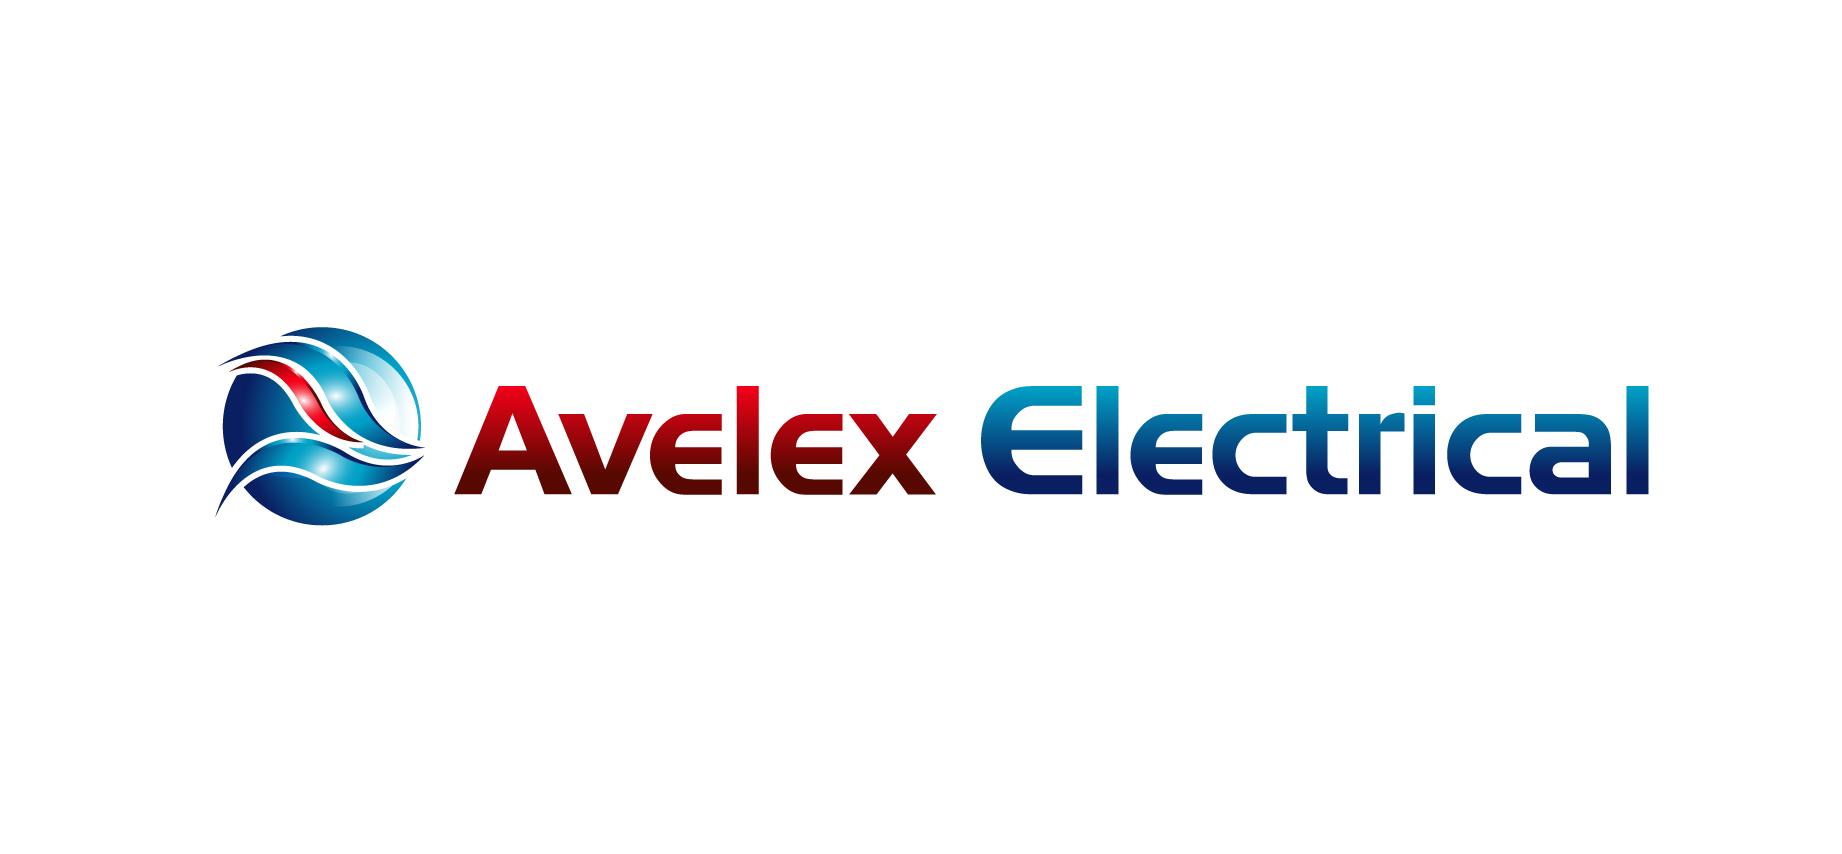 Avelex